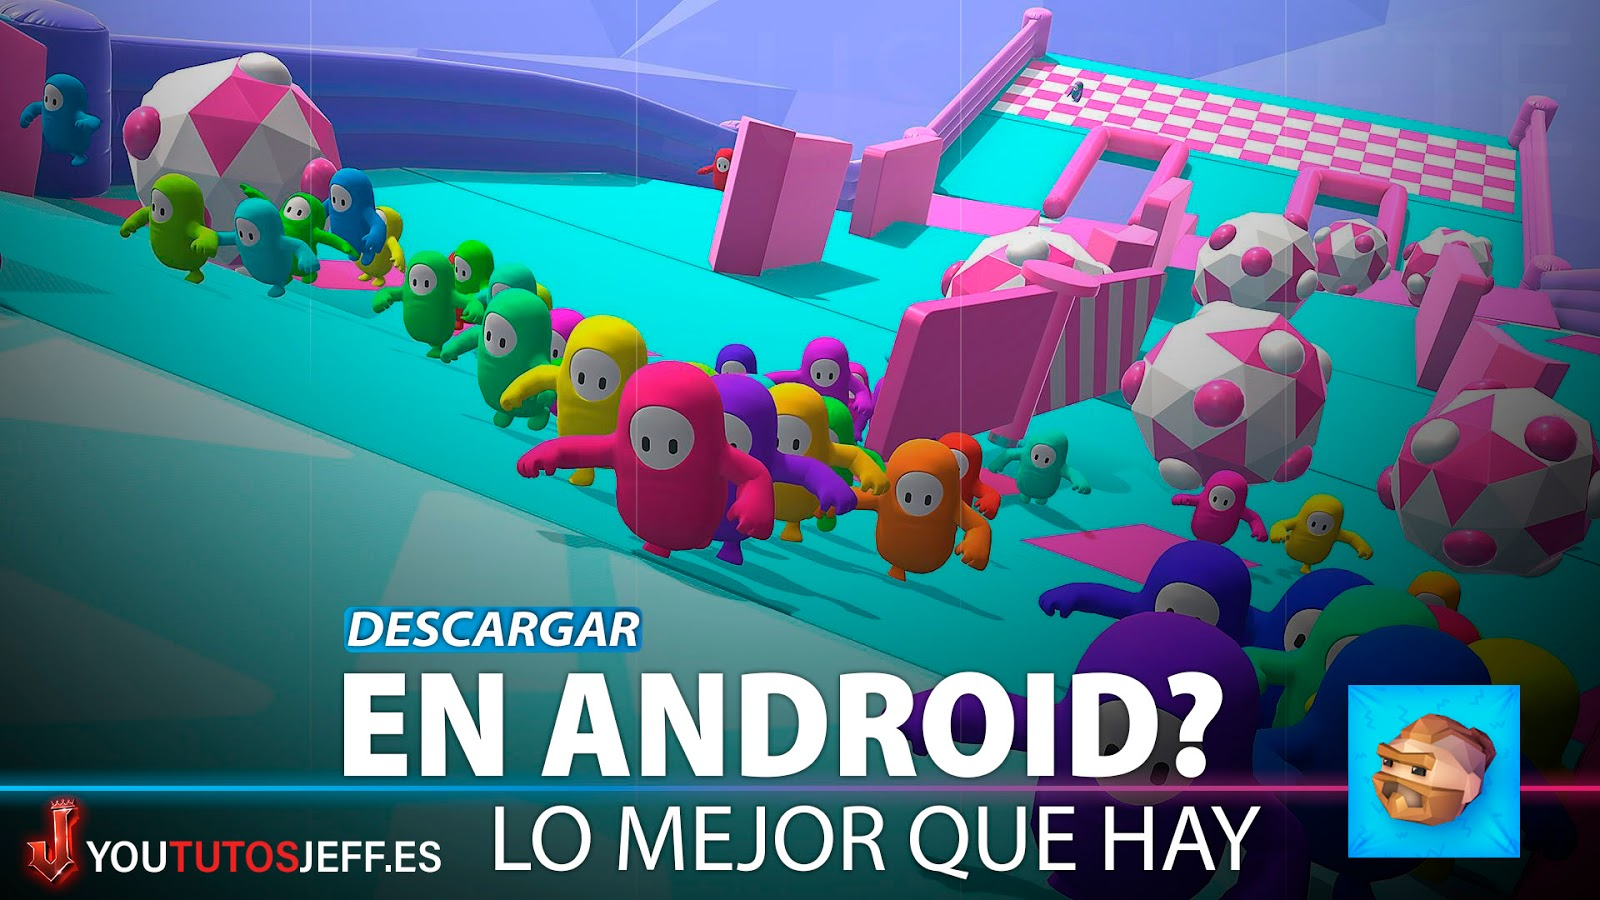 Fall Guys Android? Descargar Fall Dudes 3D GRATIS